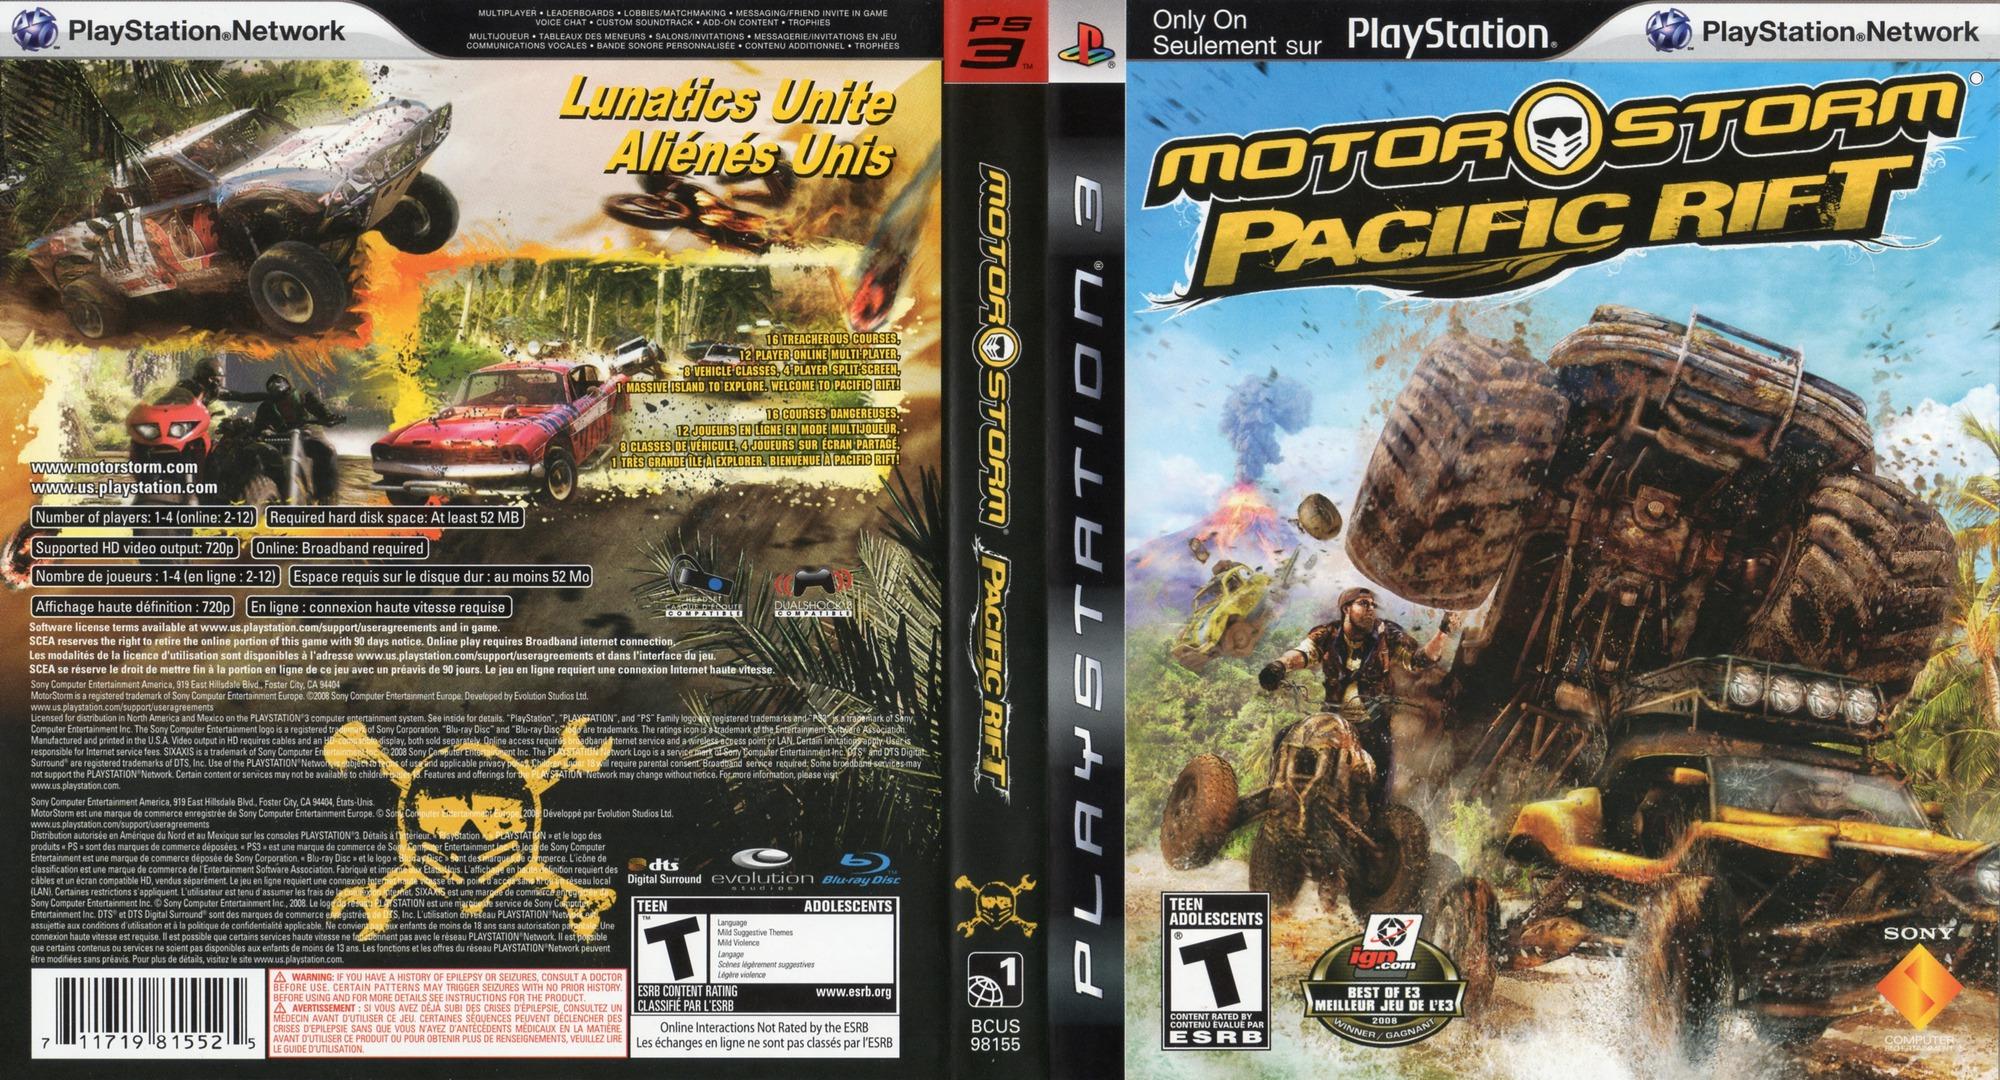 MotorStorm: Pacific Rift PS3 coverfullHQ2 (BCUS98155)